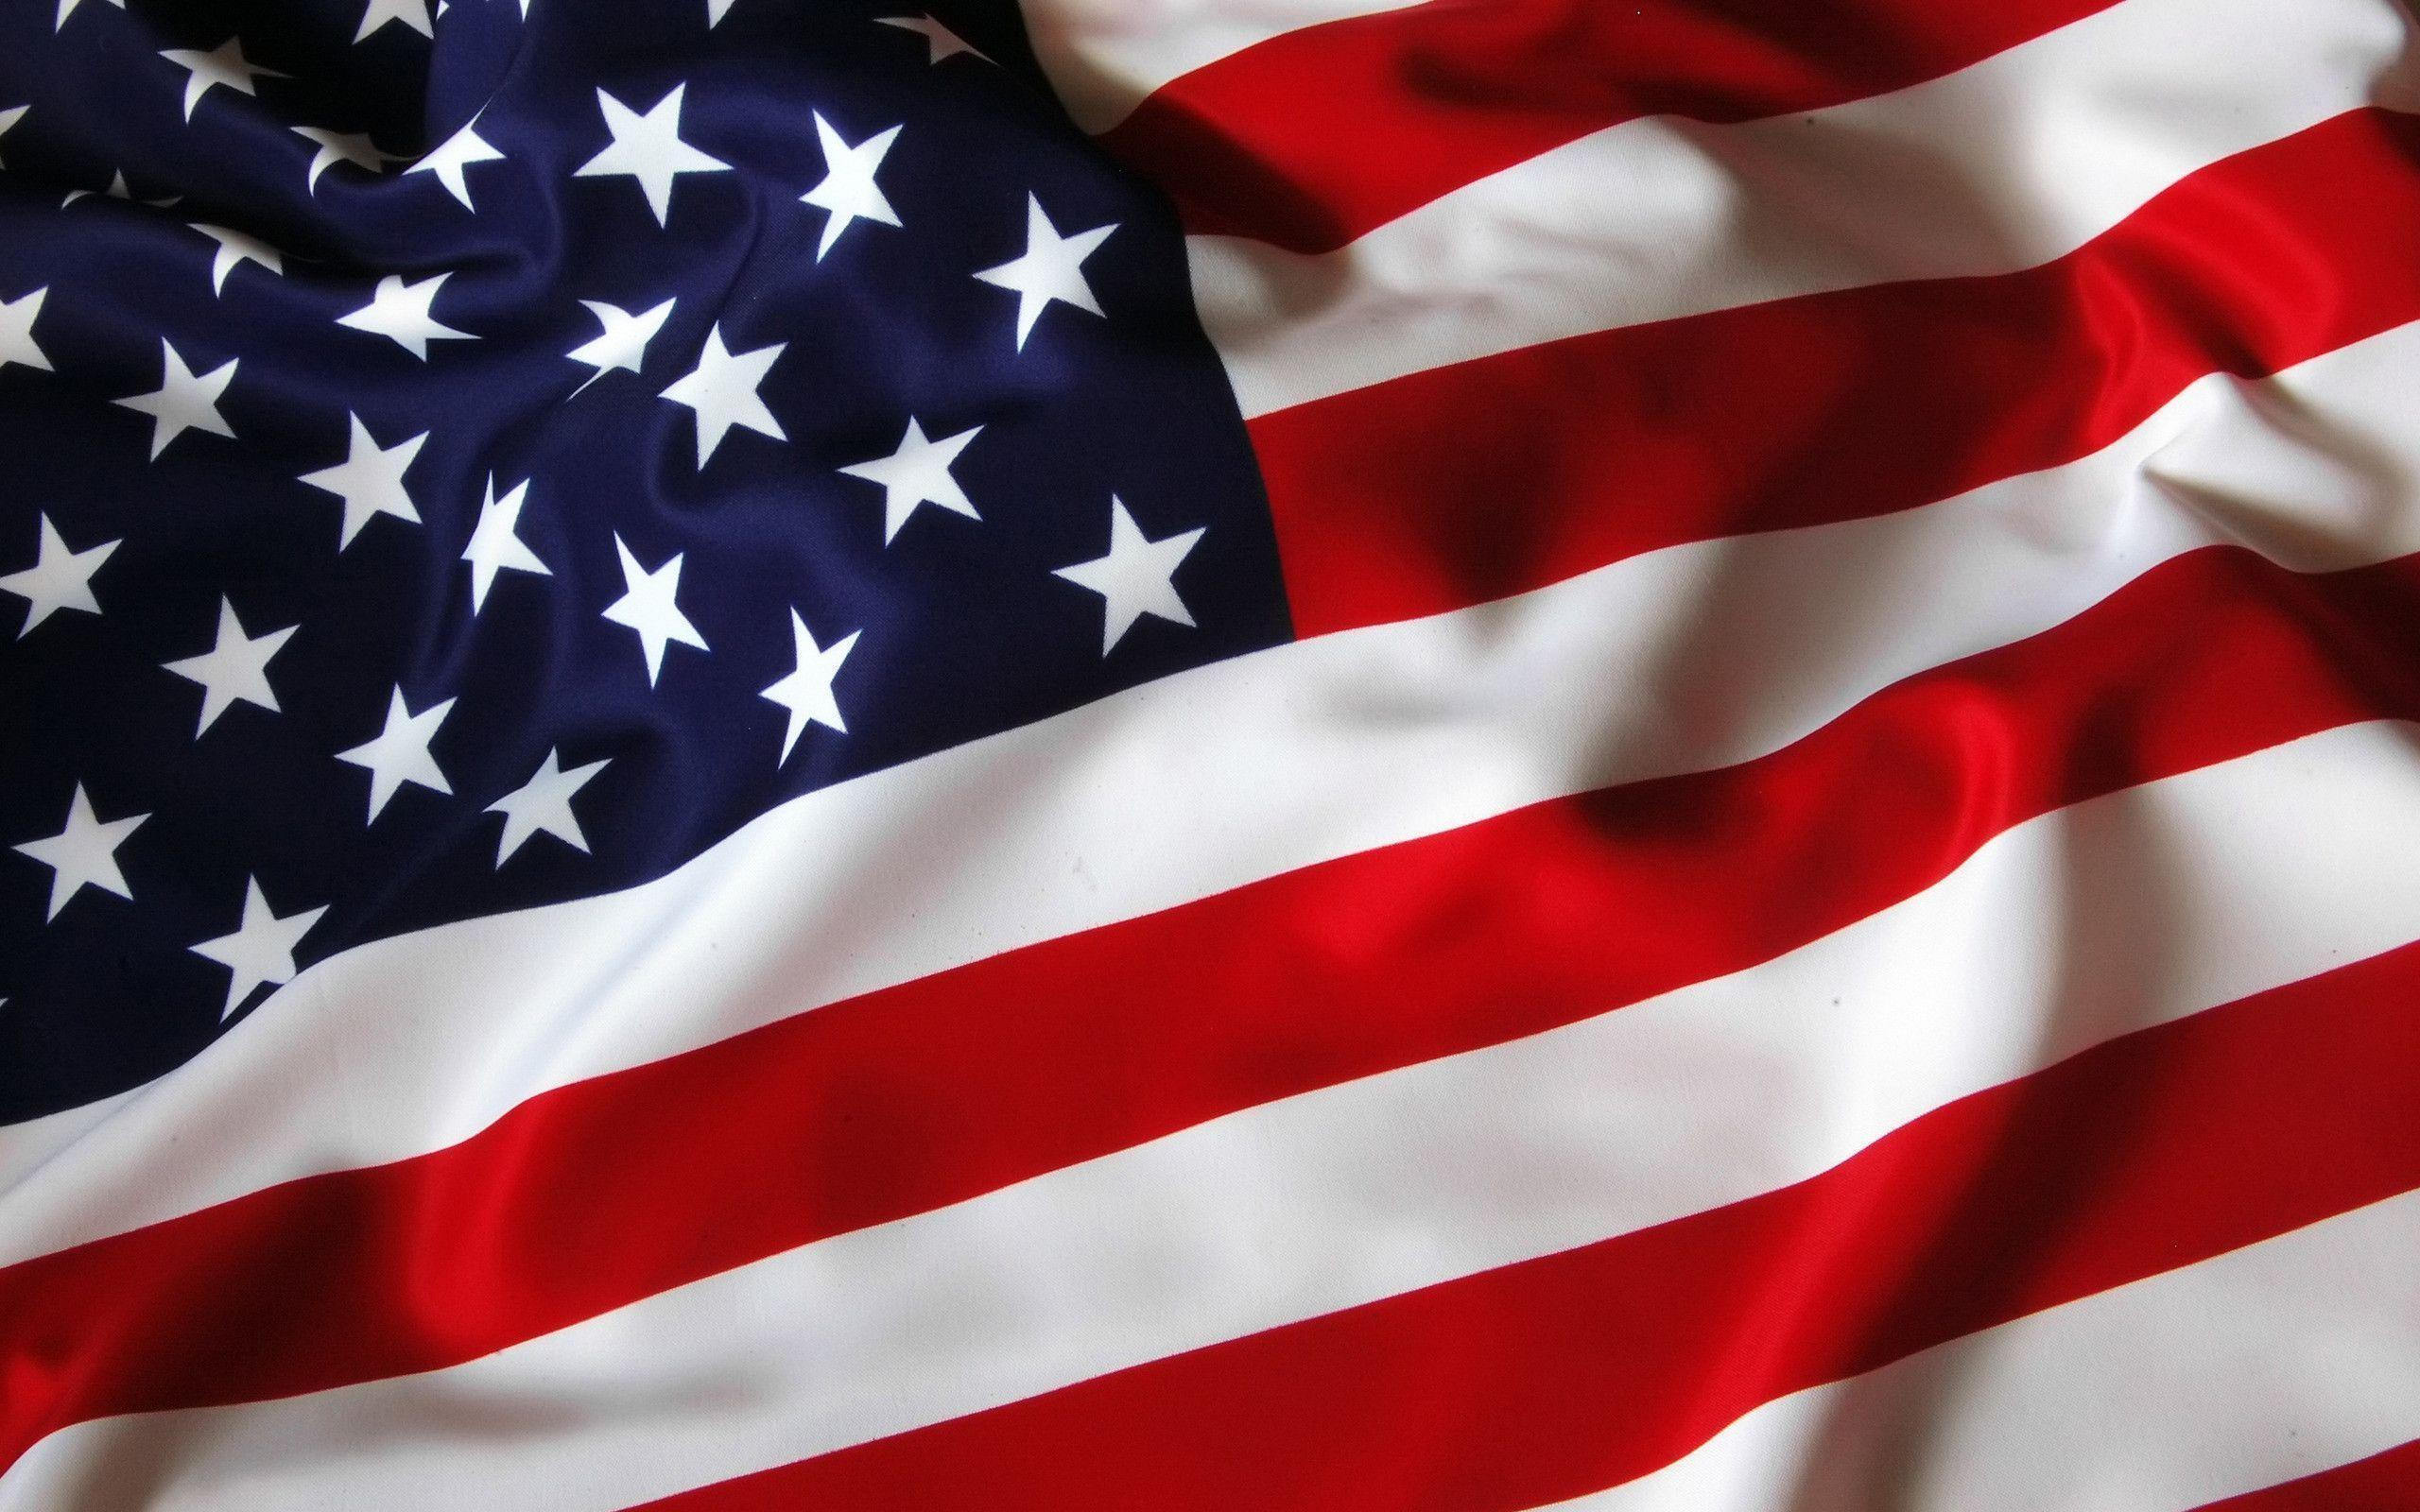 Flag USA HD Wallpaper Wide #4879 Wallpaper | WallscreenHD.